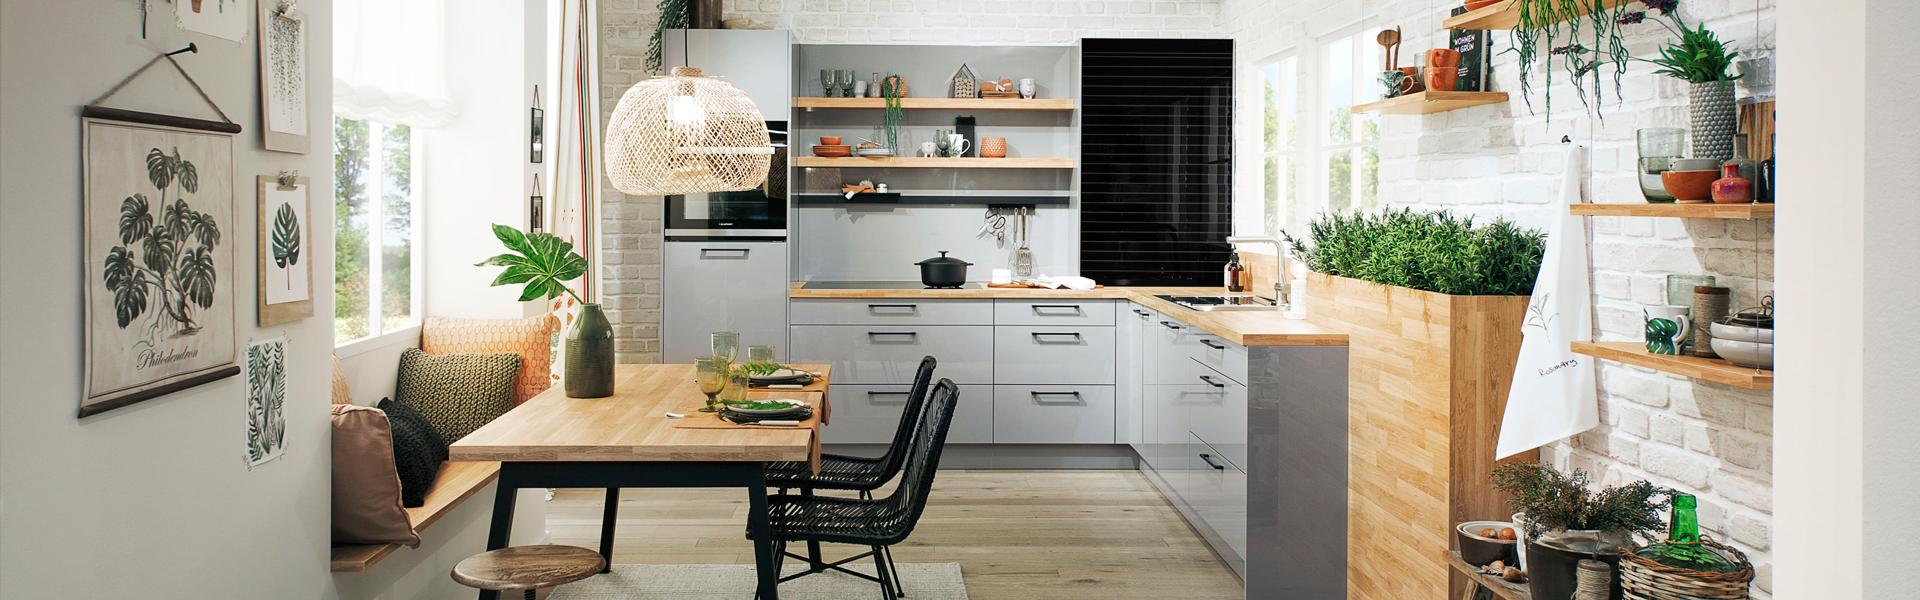 Woonkeuken | Eigenhuis Keukens